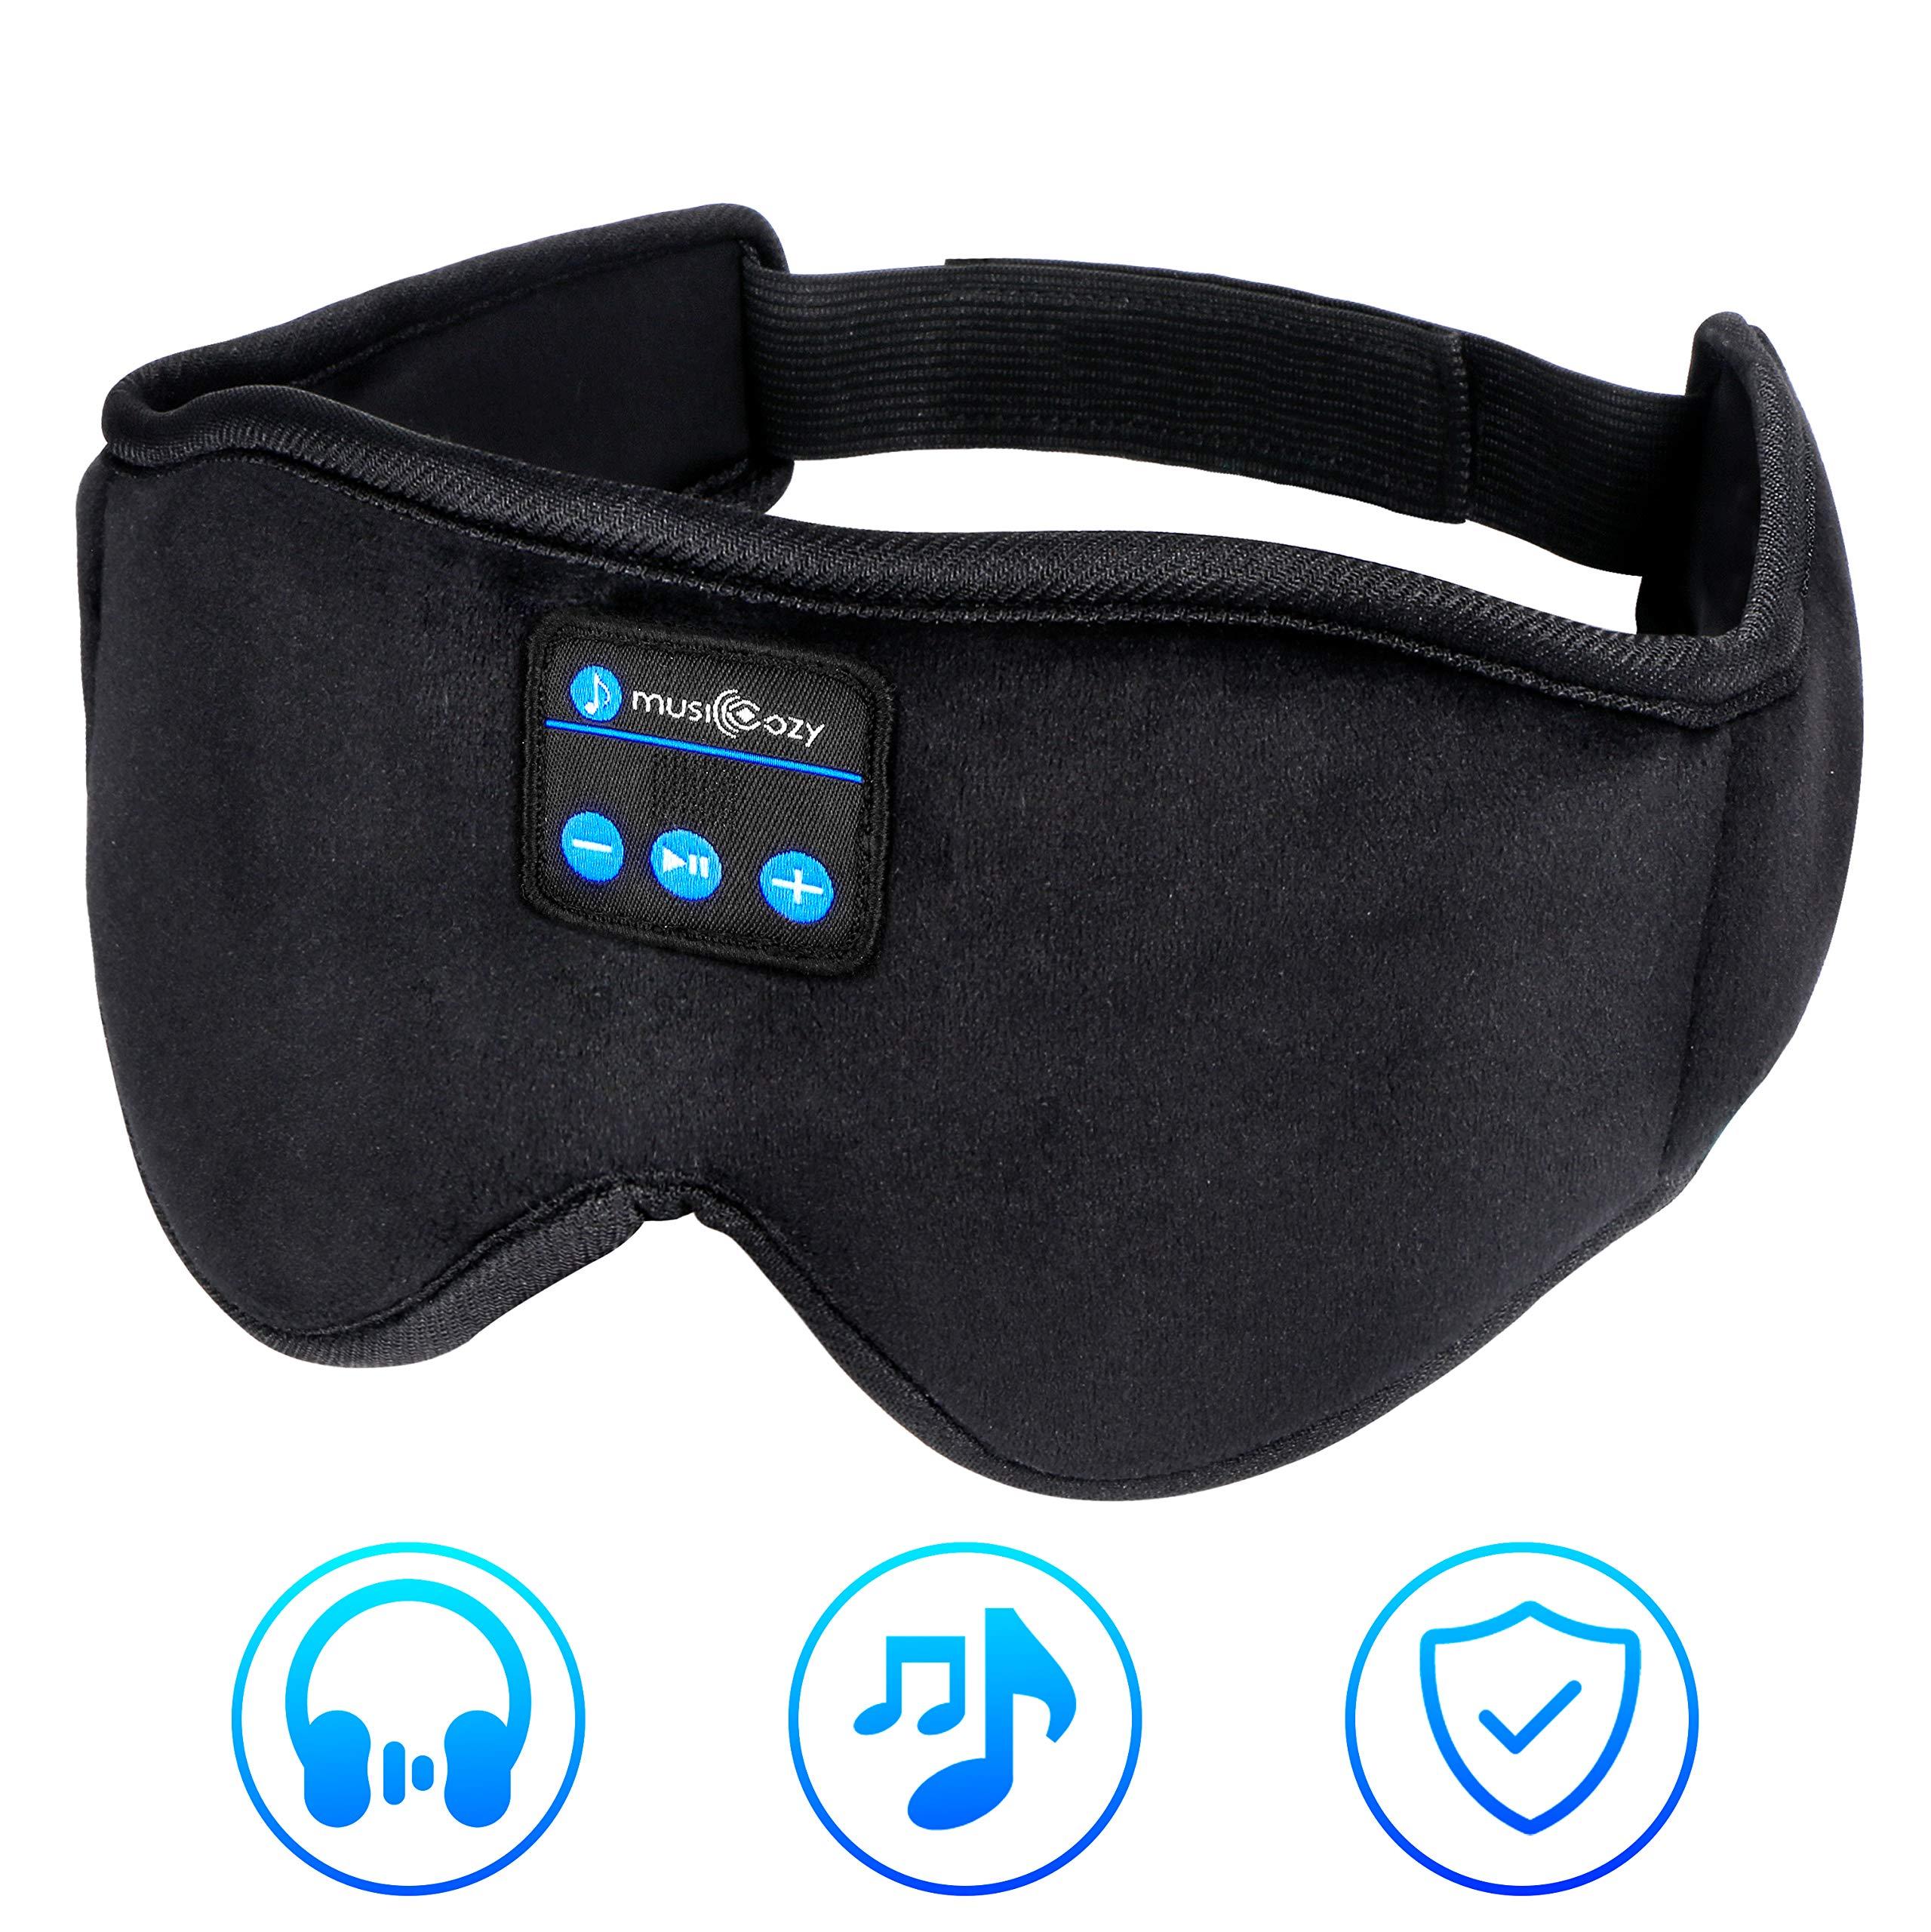 Sleep Headphones,Bluetooth Sleeping Headphones Wireless Eye Mask 2019 Upgraded Music Travel Sleep Headset Build in Microphone Washable for Side Sleepers